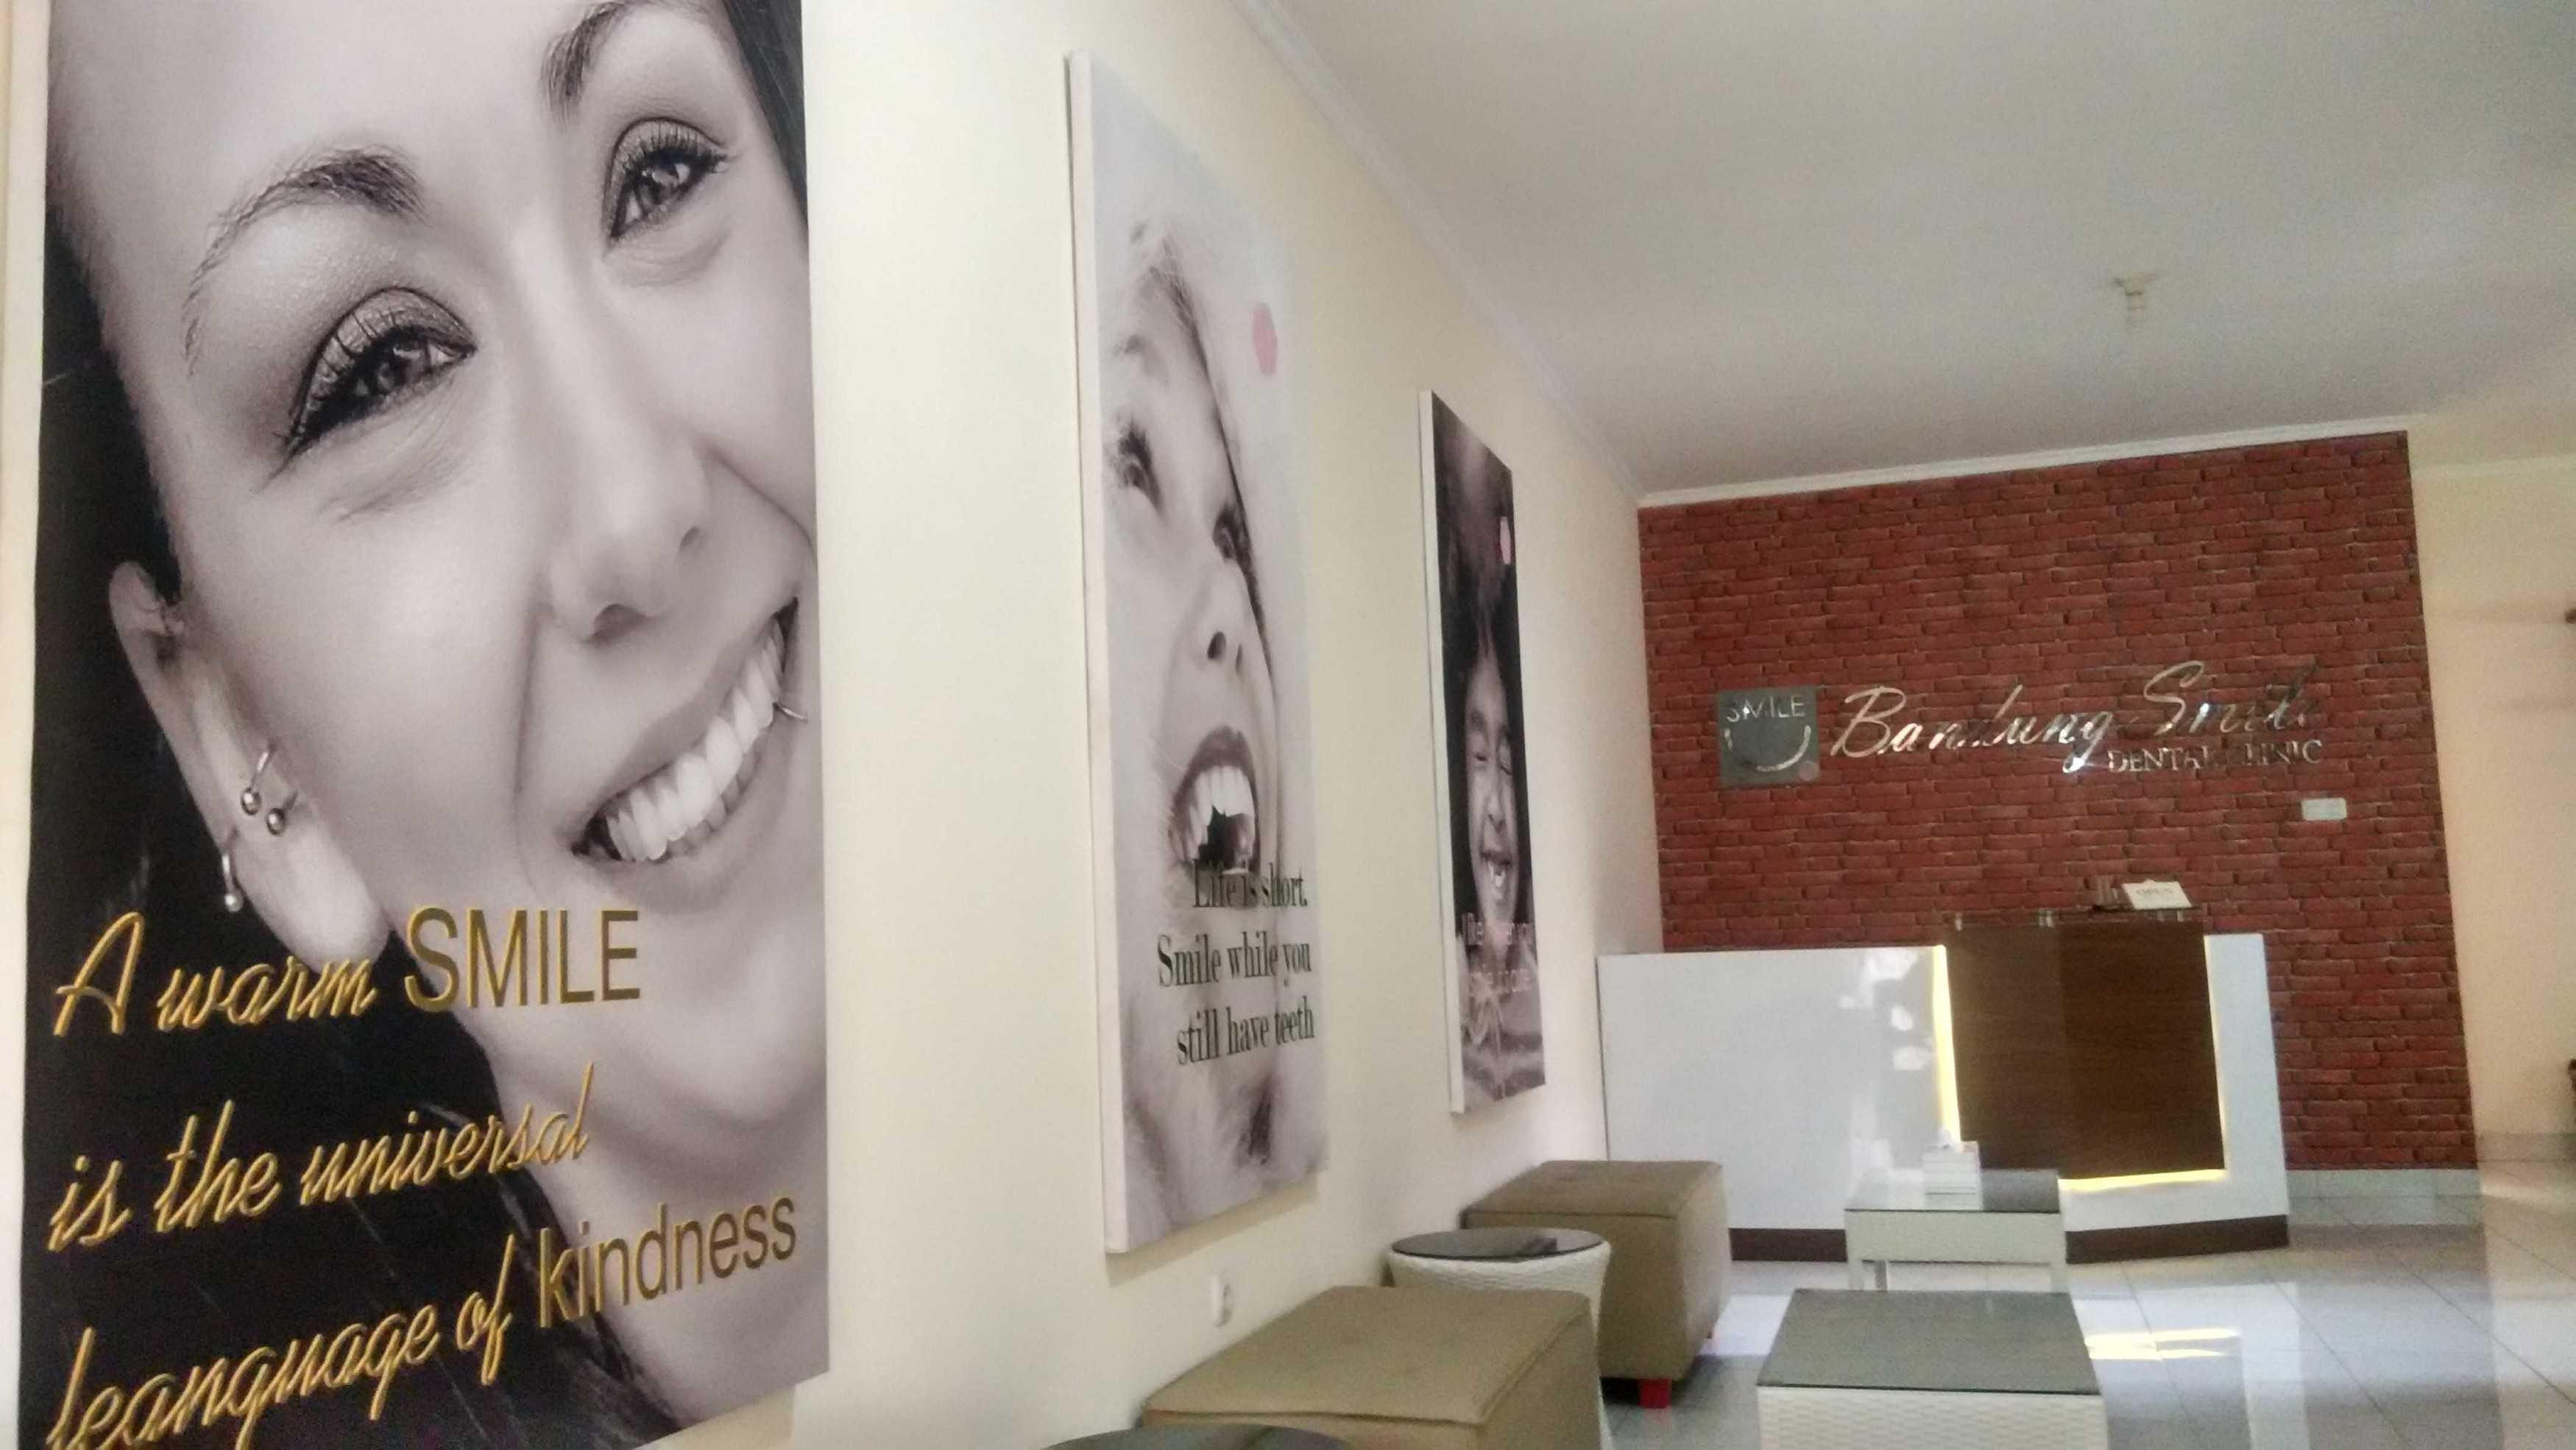 4 Sisi Indonesia Interior Dental Clinic Bandung, Bandung City, West Java, Indonesia  Img20161121113443Hdr   33424